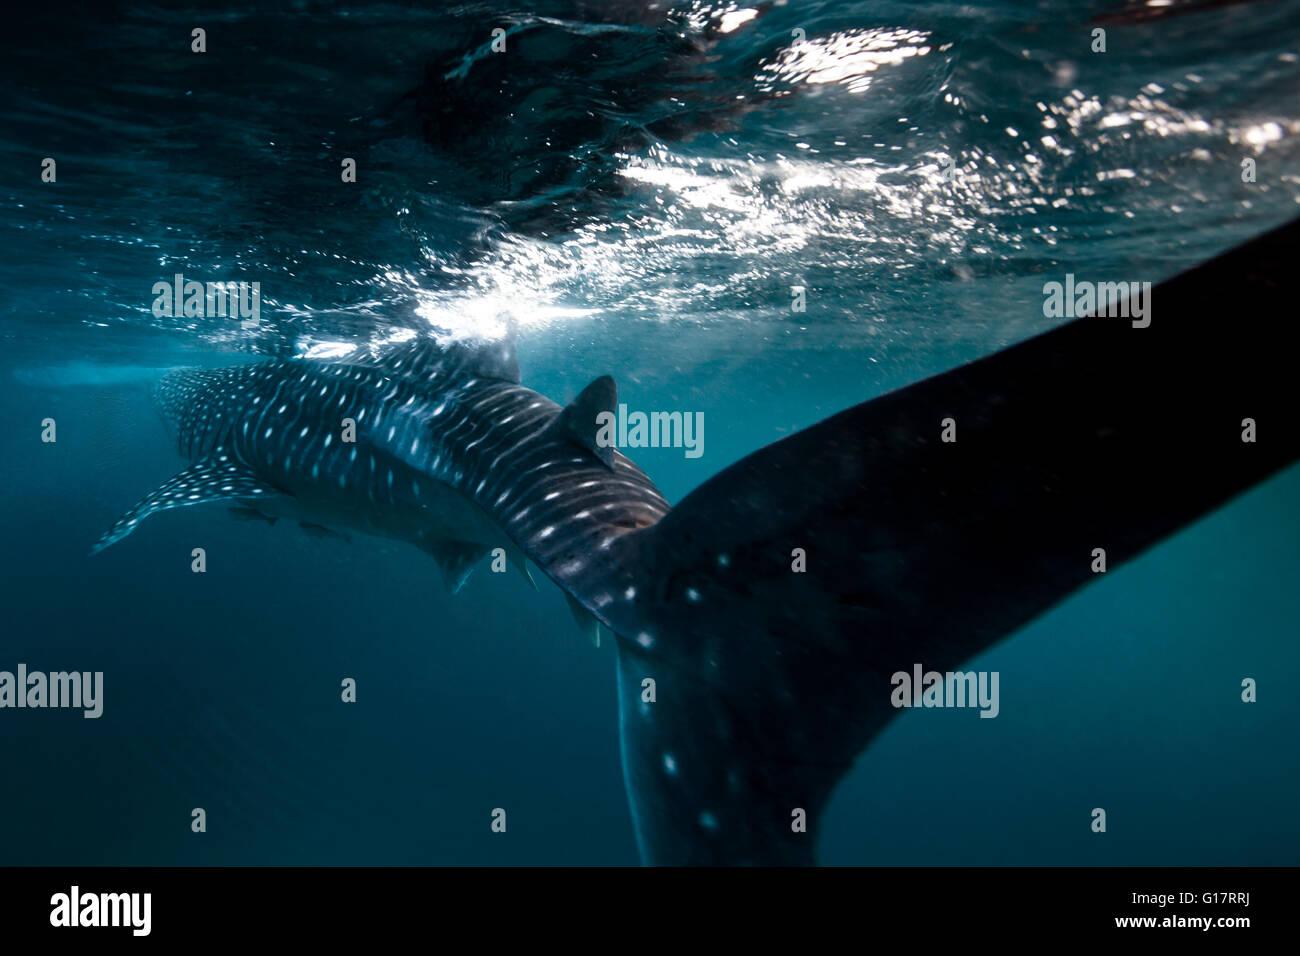 Tiburón ballena (Rhincodon typus) nadando en las aguas profundas frente a la isla de Malapascua, Cebu, Filipinas Imagen De Stock